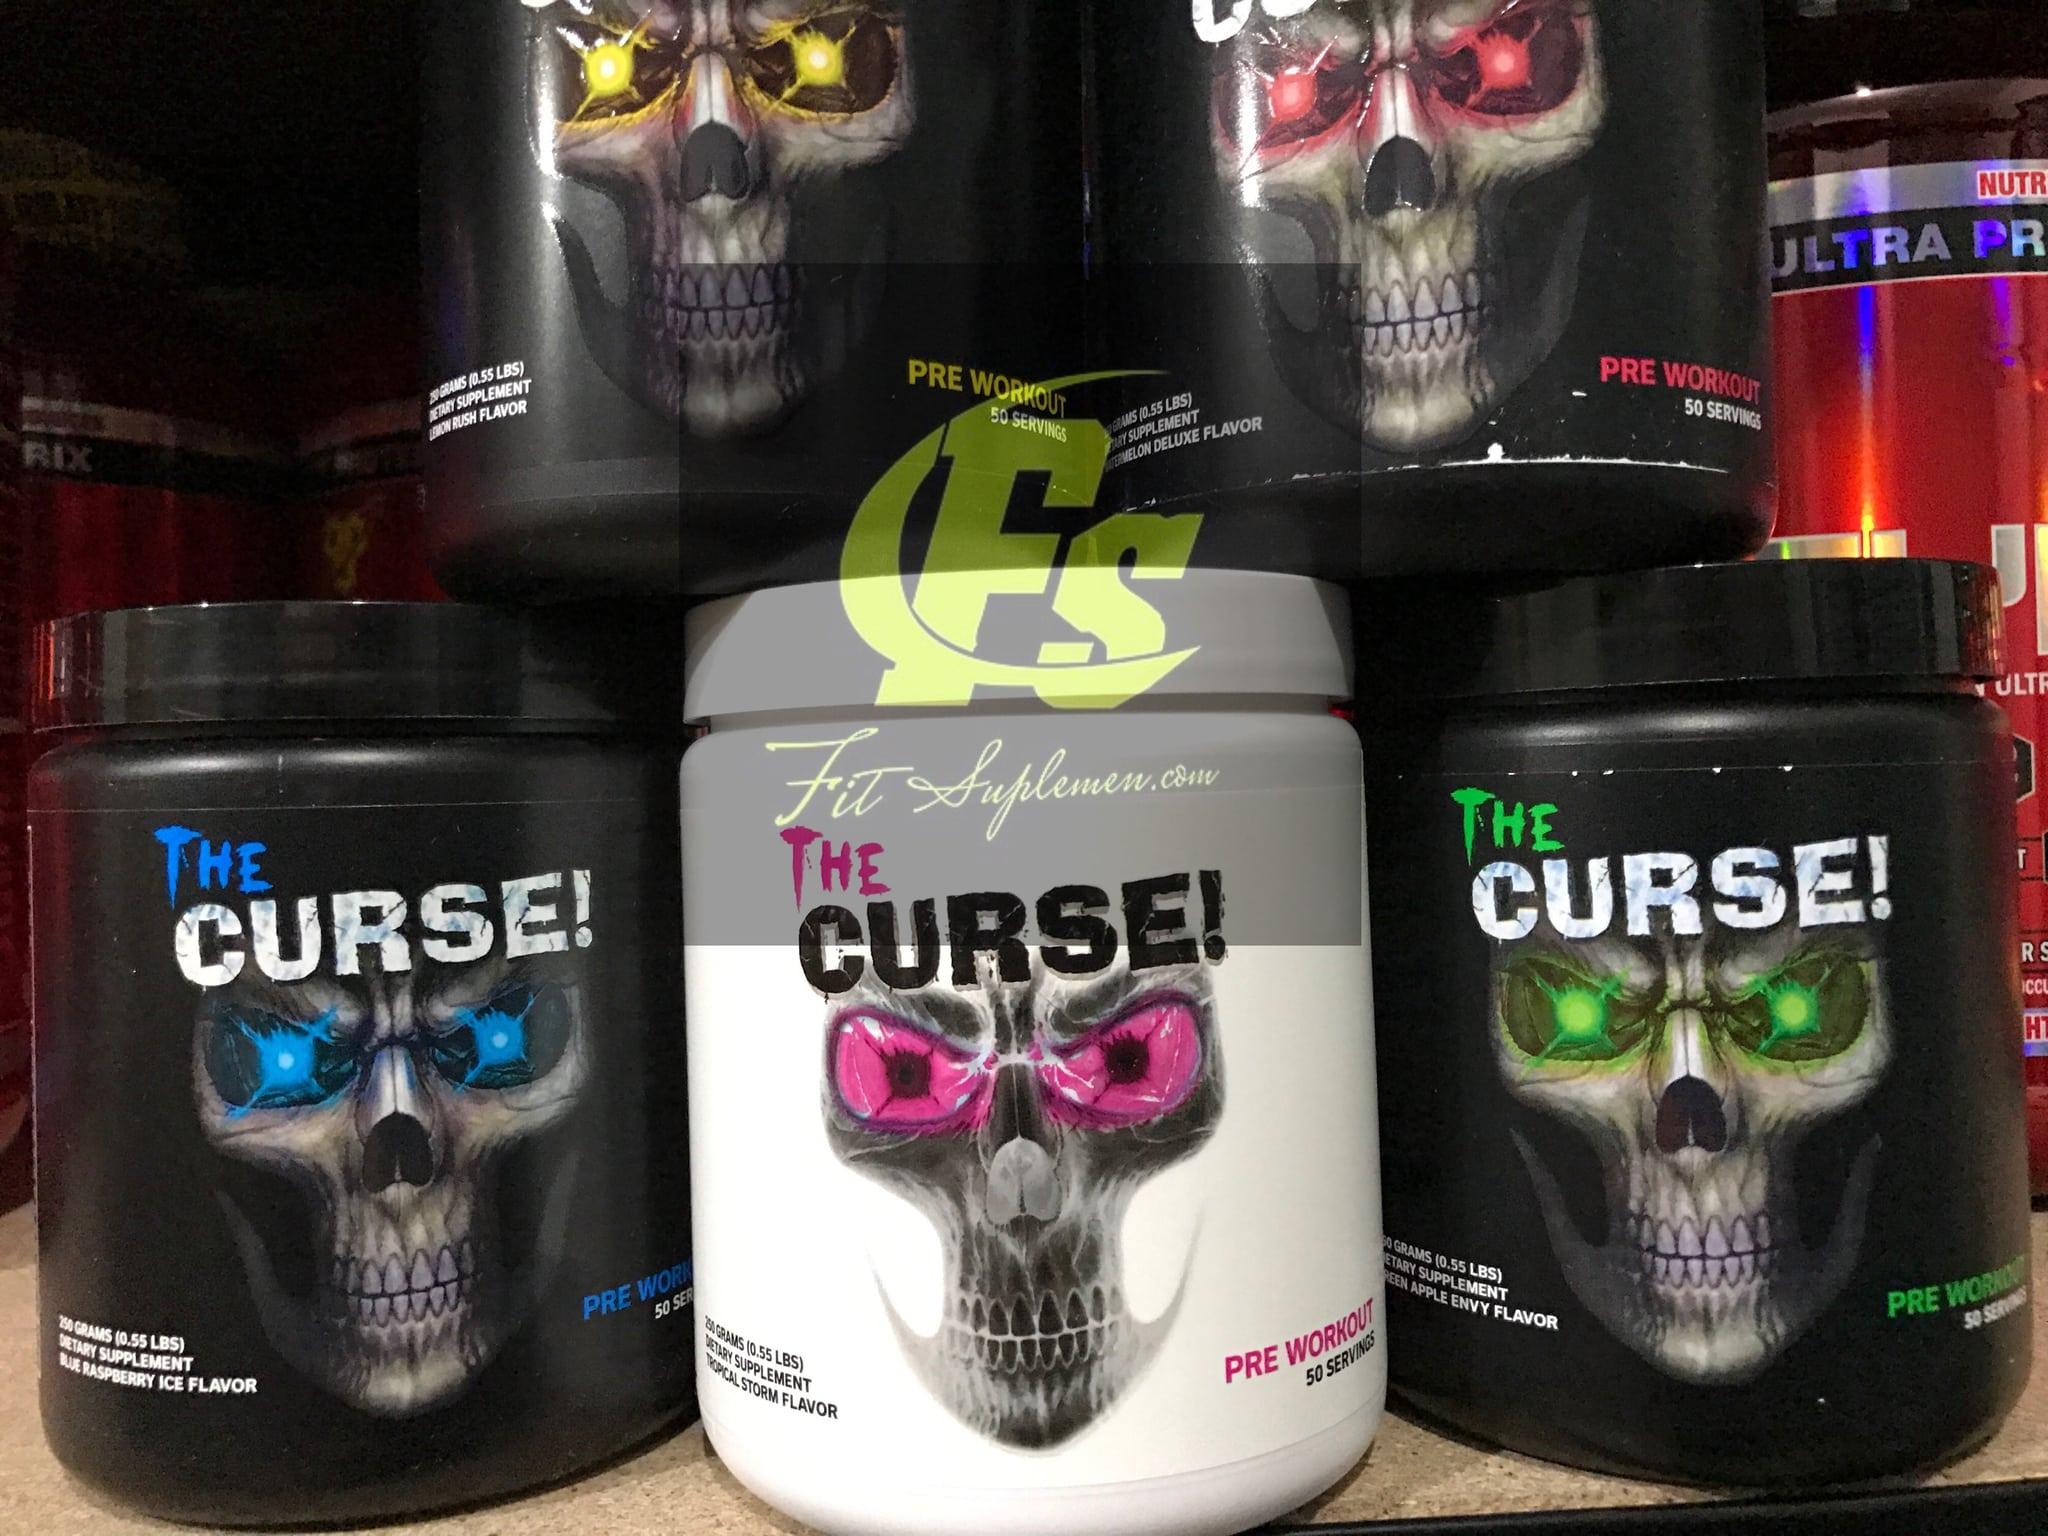 Jual The Curse 50 Servings Thecurse 50serving Pre Workout Cobra Labs Suplemen Cobralabs Pwo Fit Tokopedia